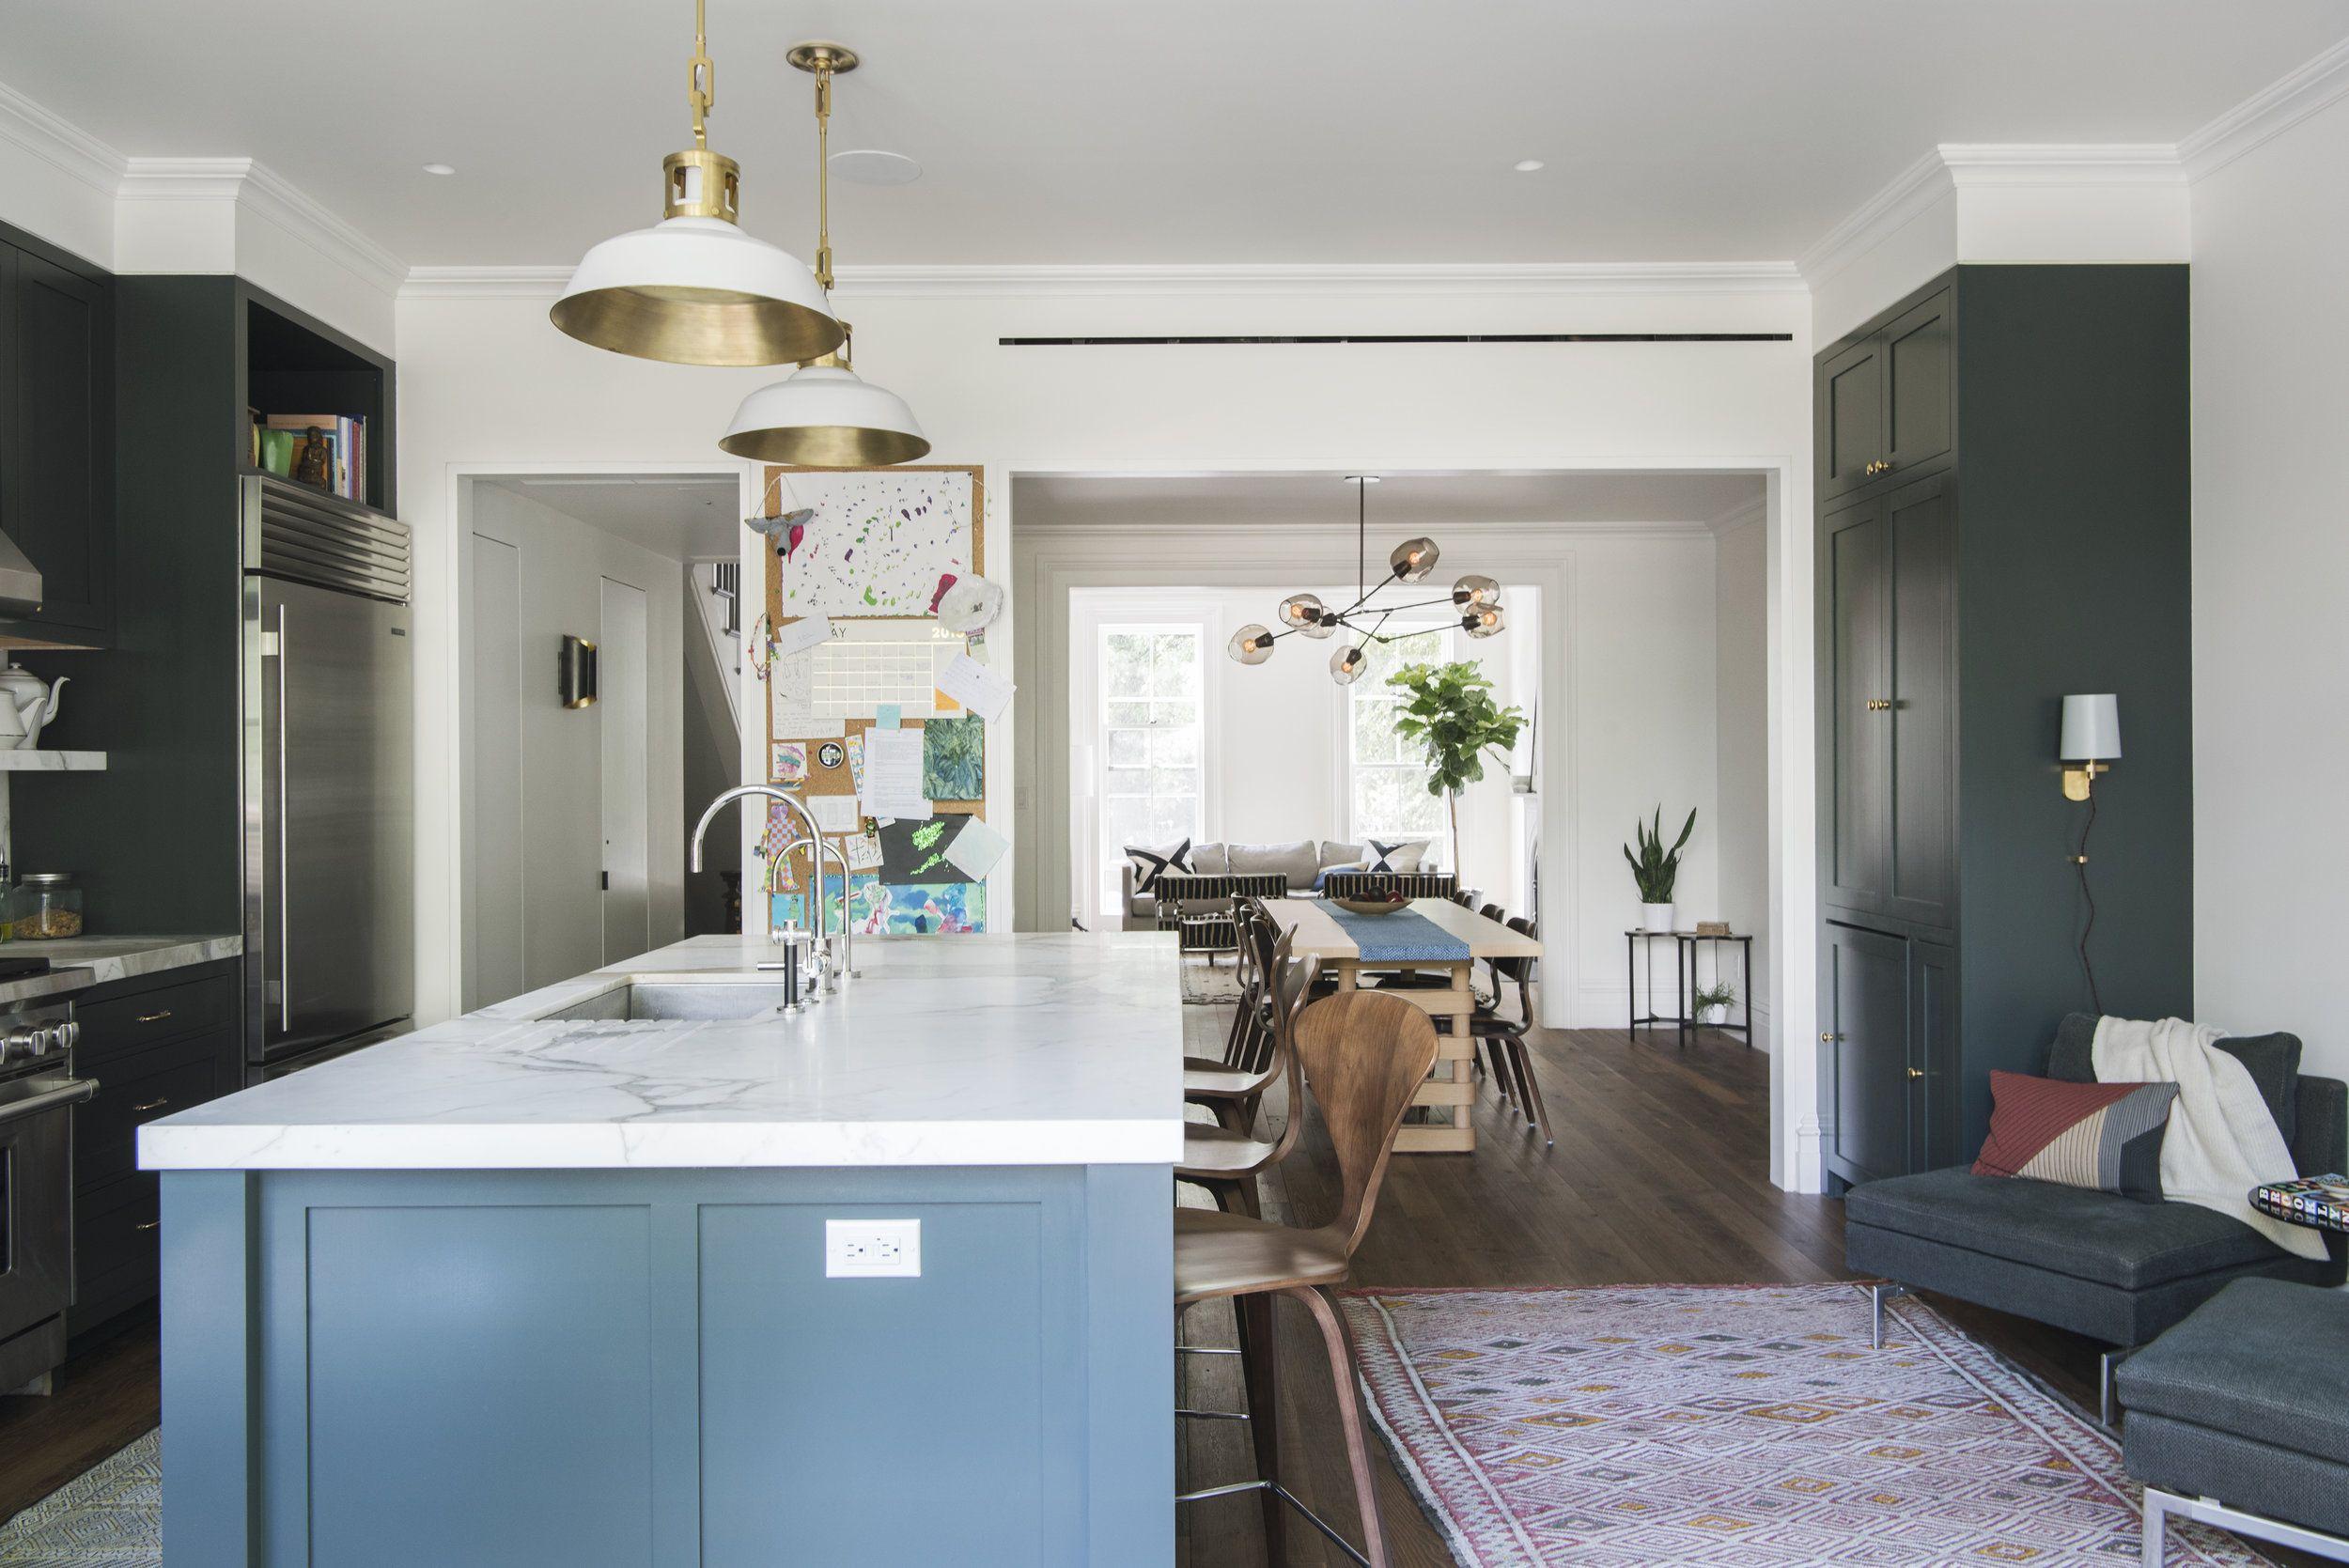 Prospectlefferts townhouse u ben herzog architect pc kitchen